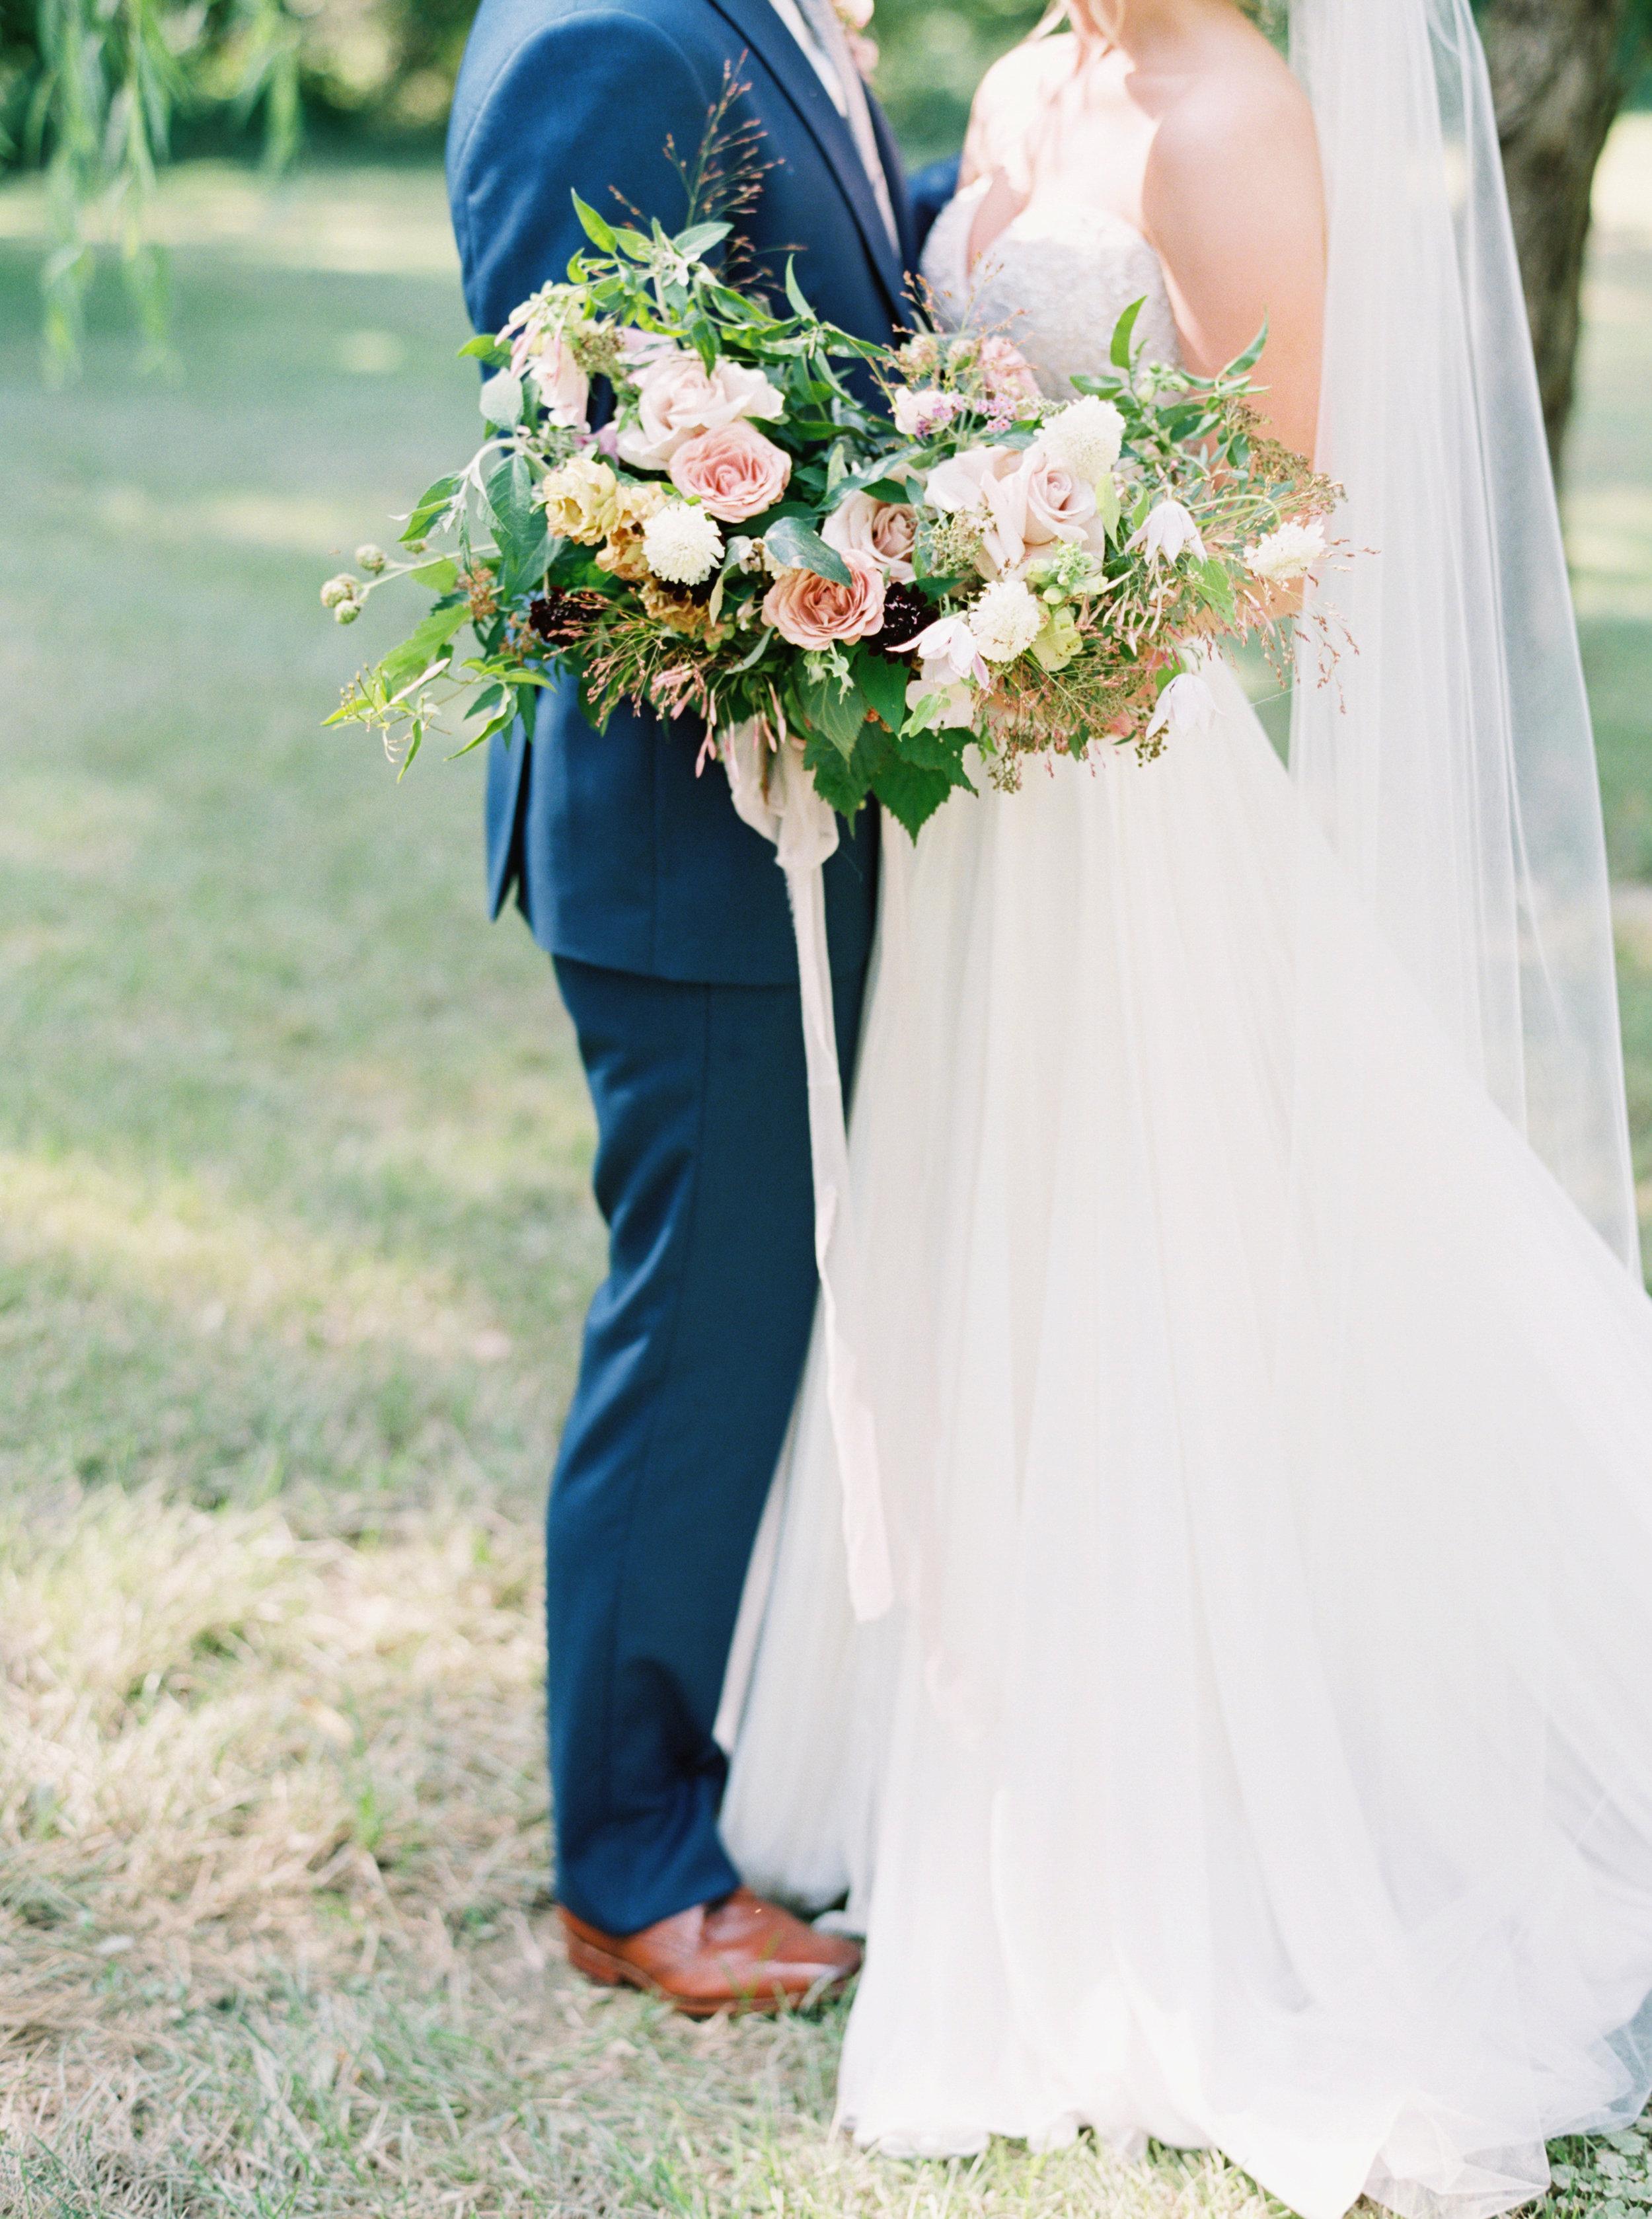 nicoleclarey_jenna+casey_bride+groom-35.jpg